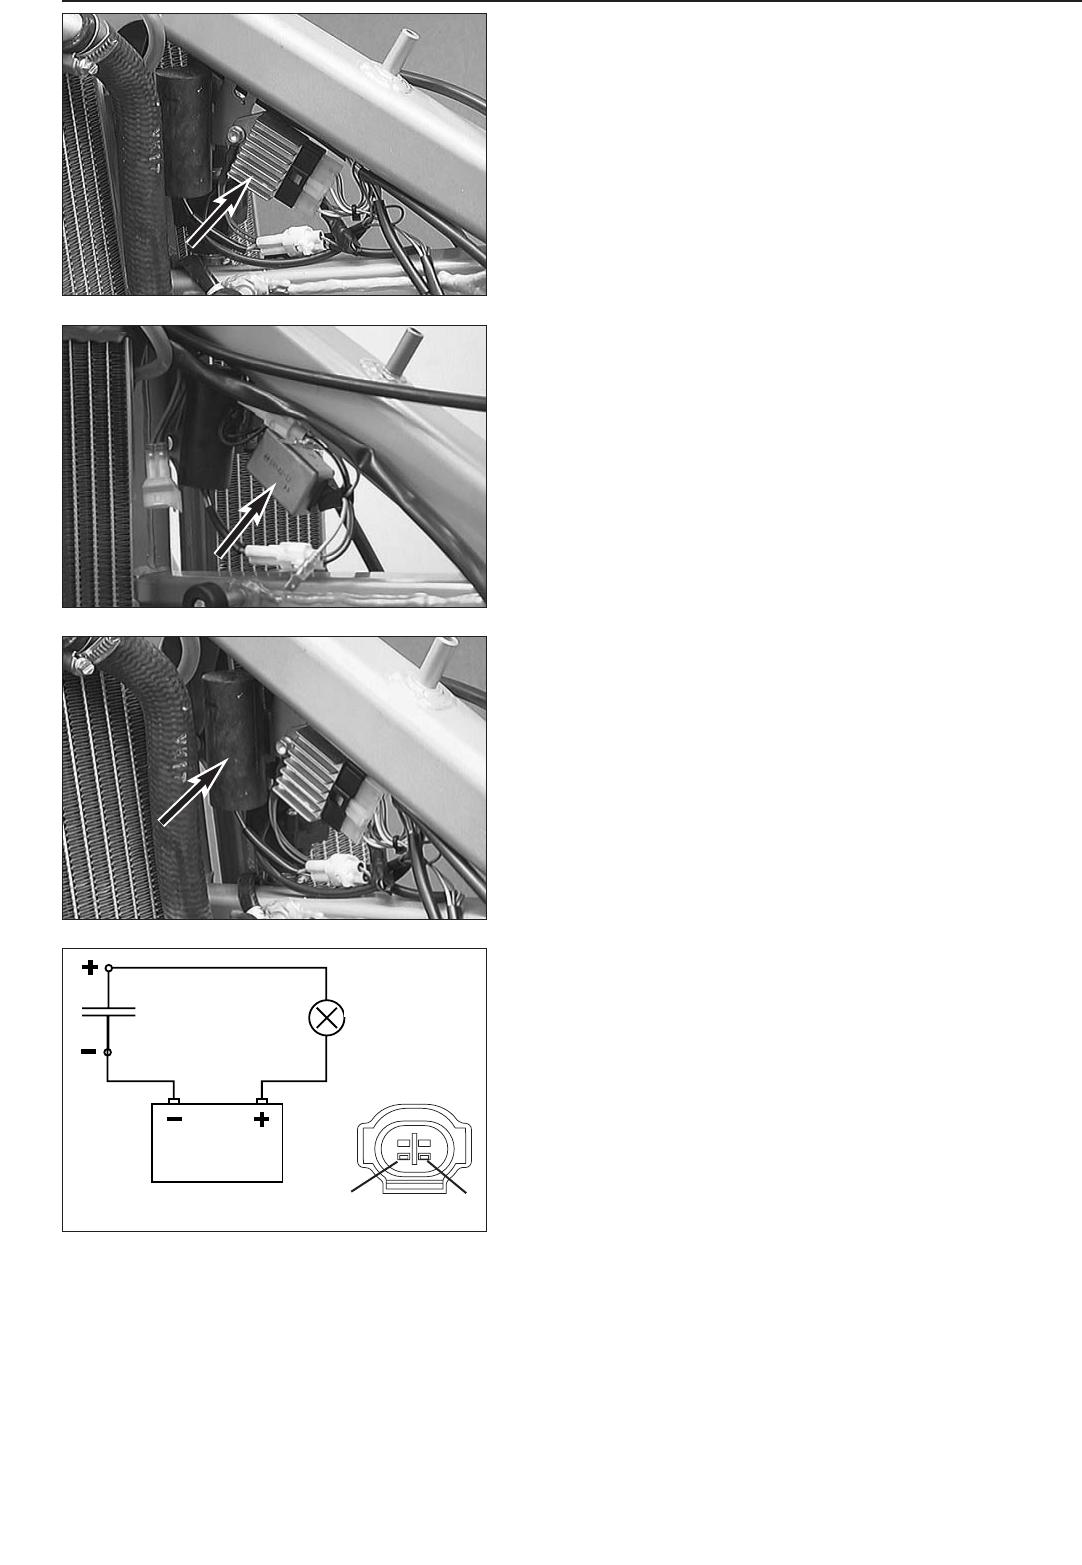 Repair manual KTM 250 / 300 / 380 Art No 3206004 -E